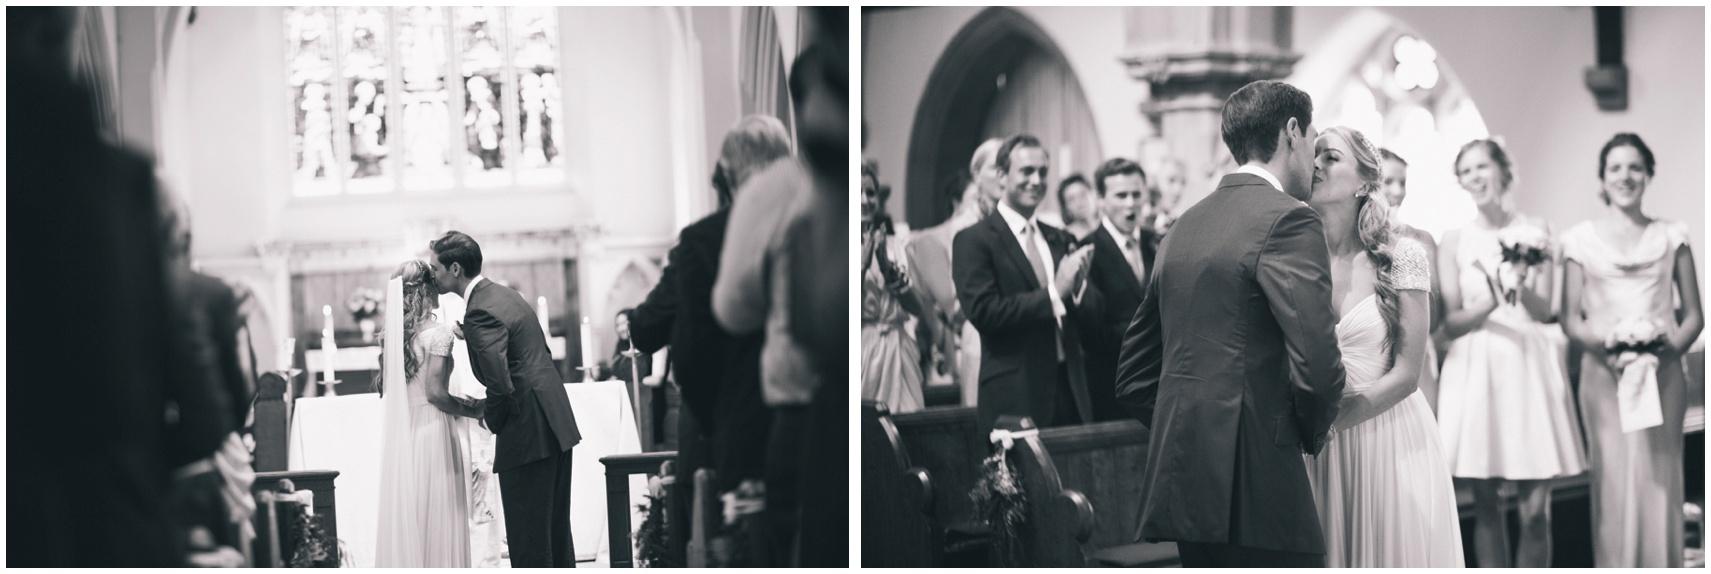 BMC Wedding photography Rutland_0289.jpg